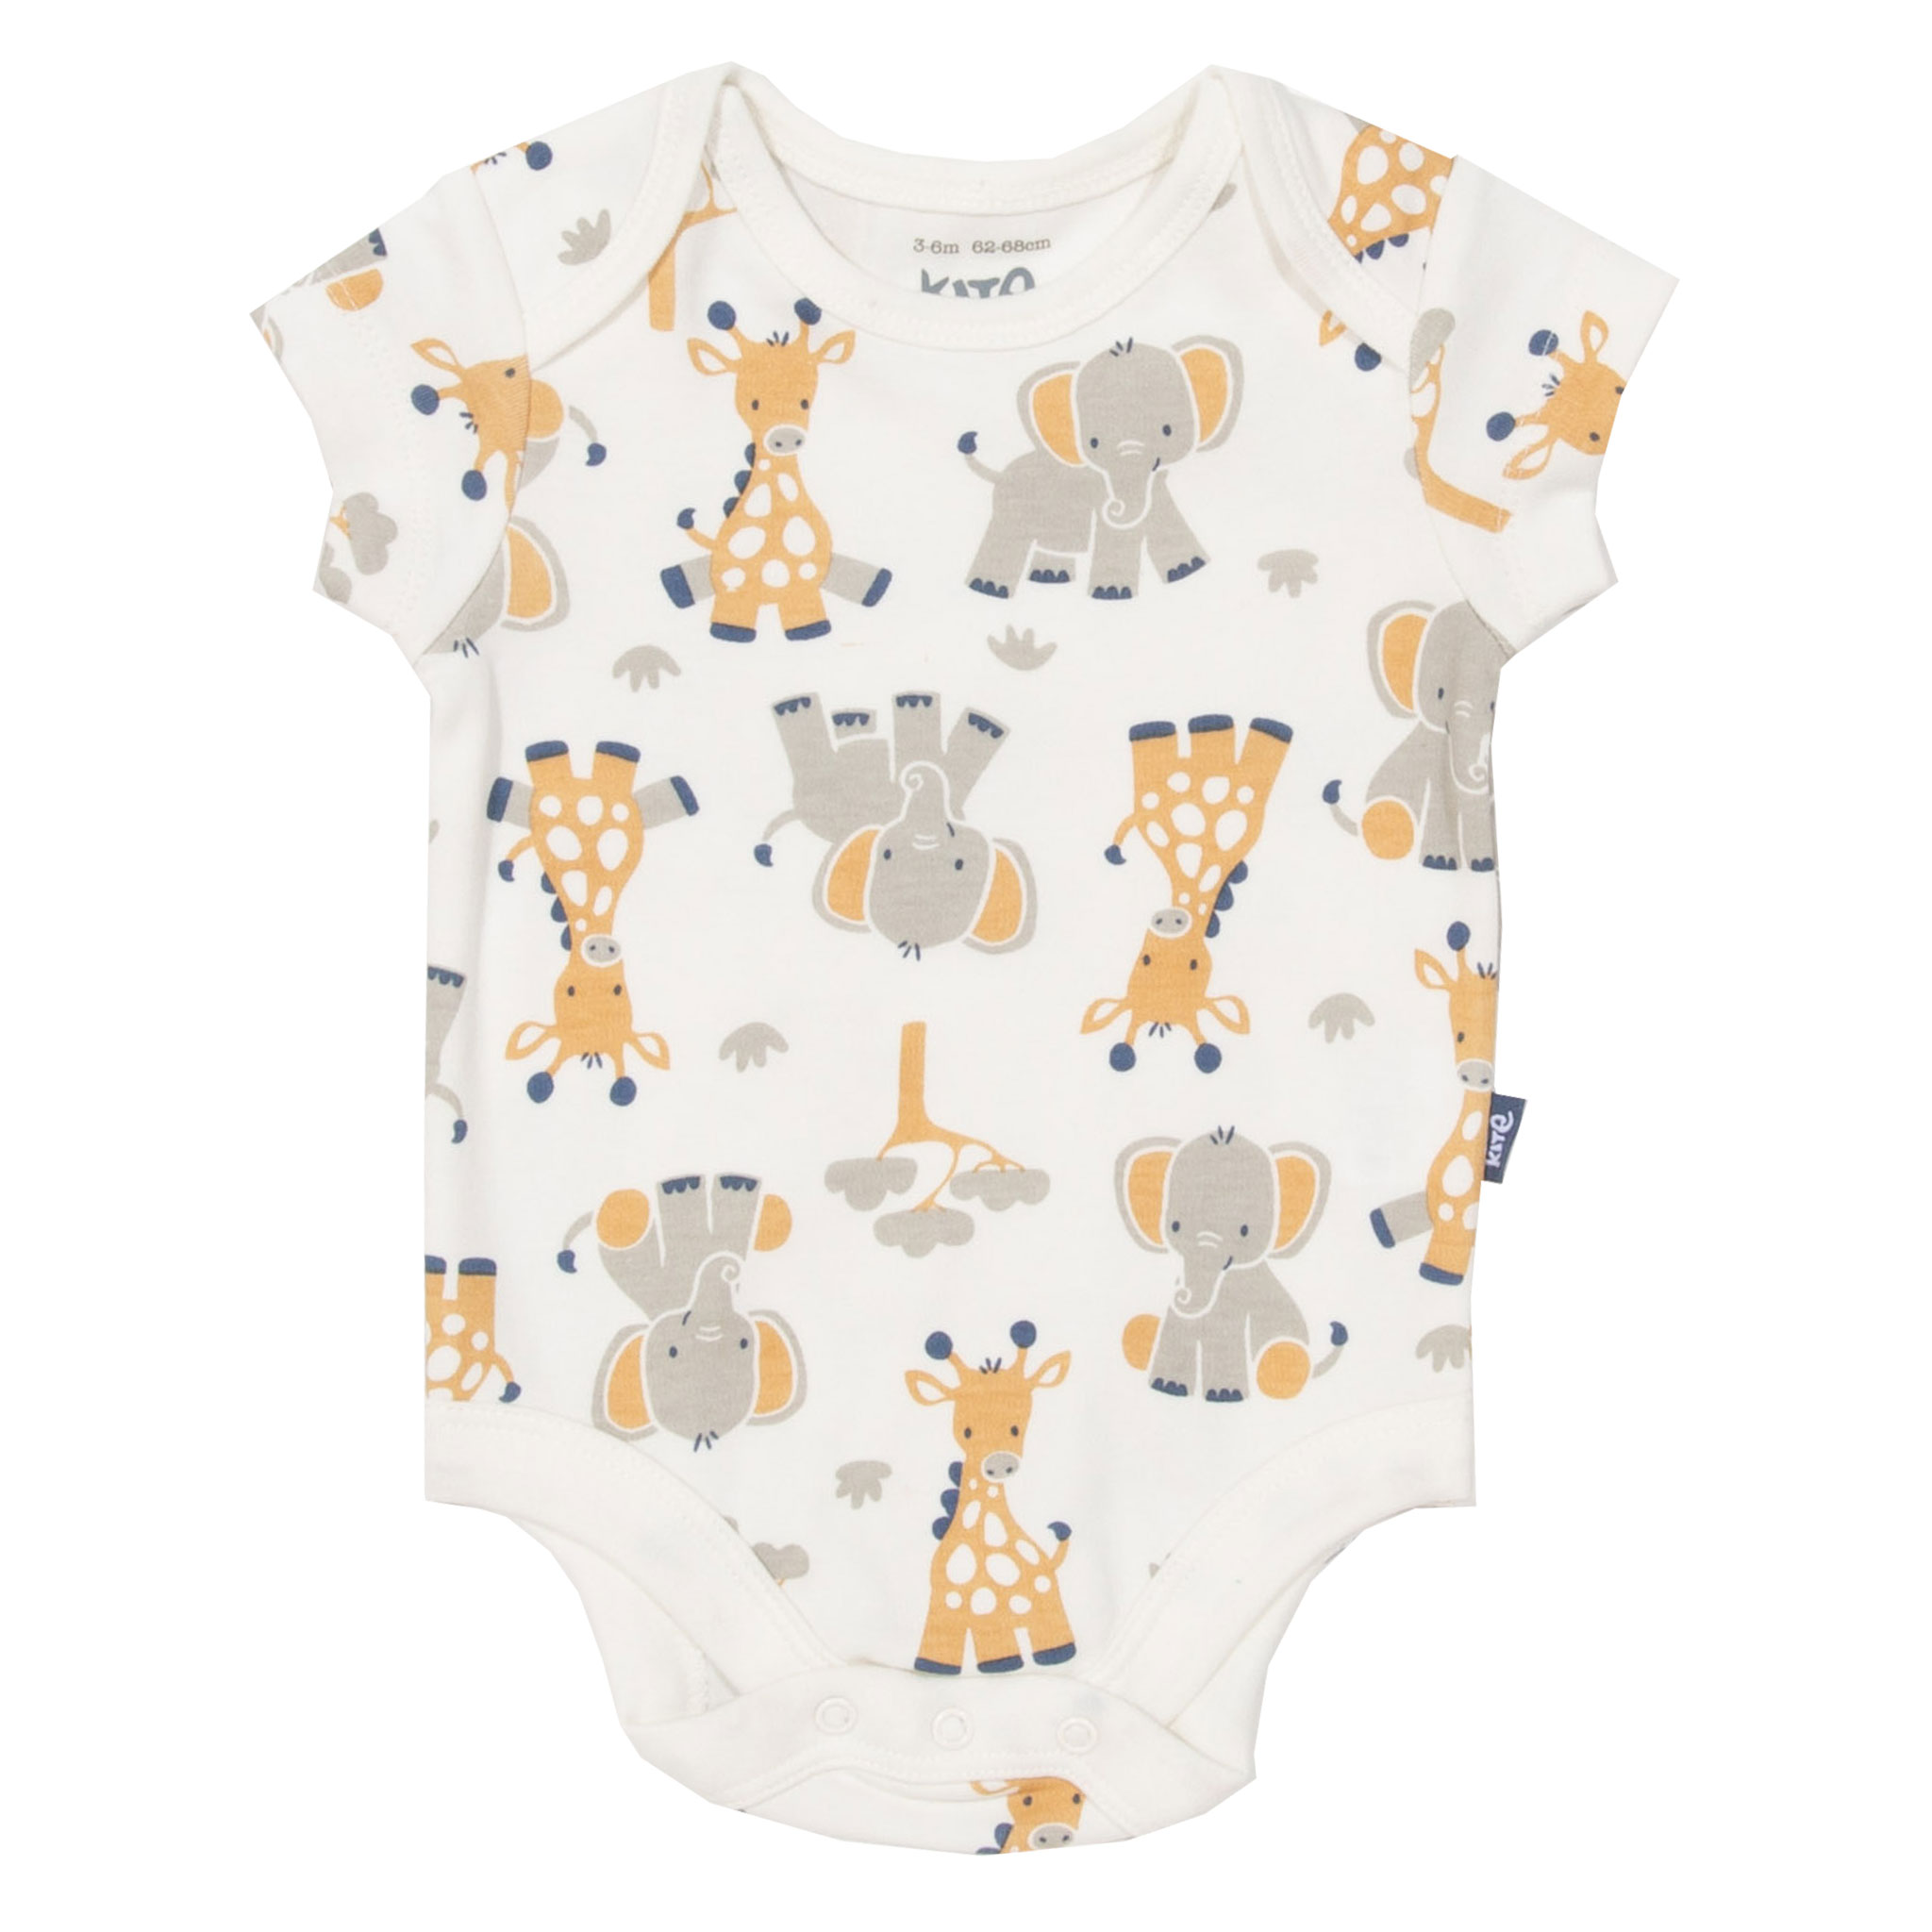 Kite Giraffe Set